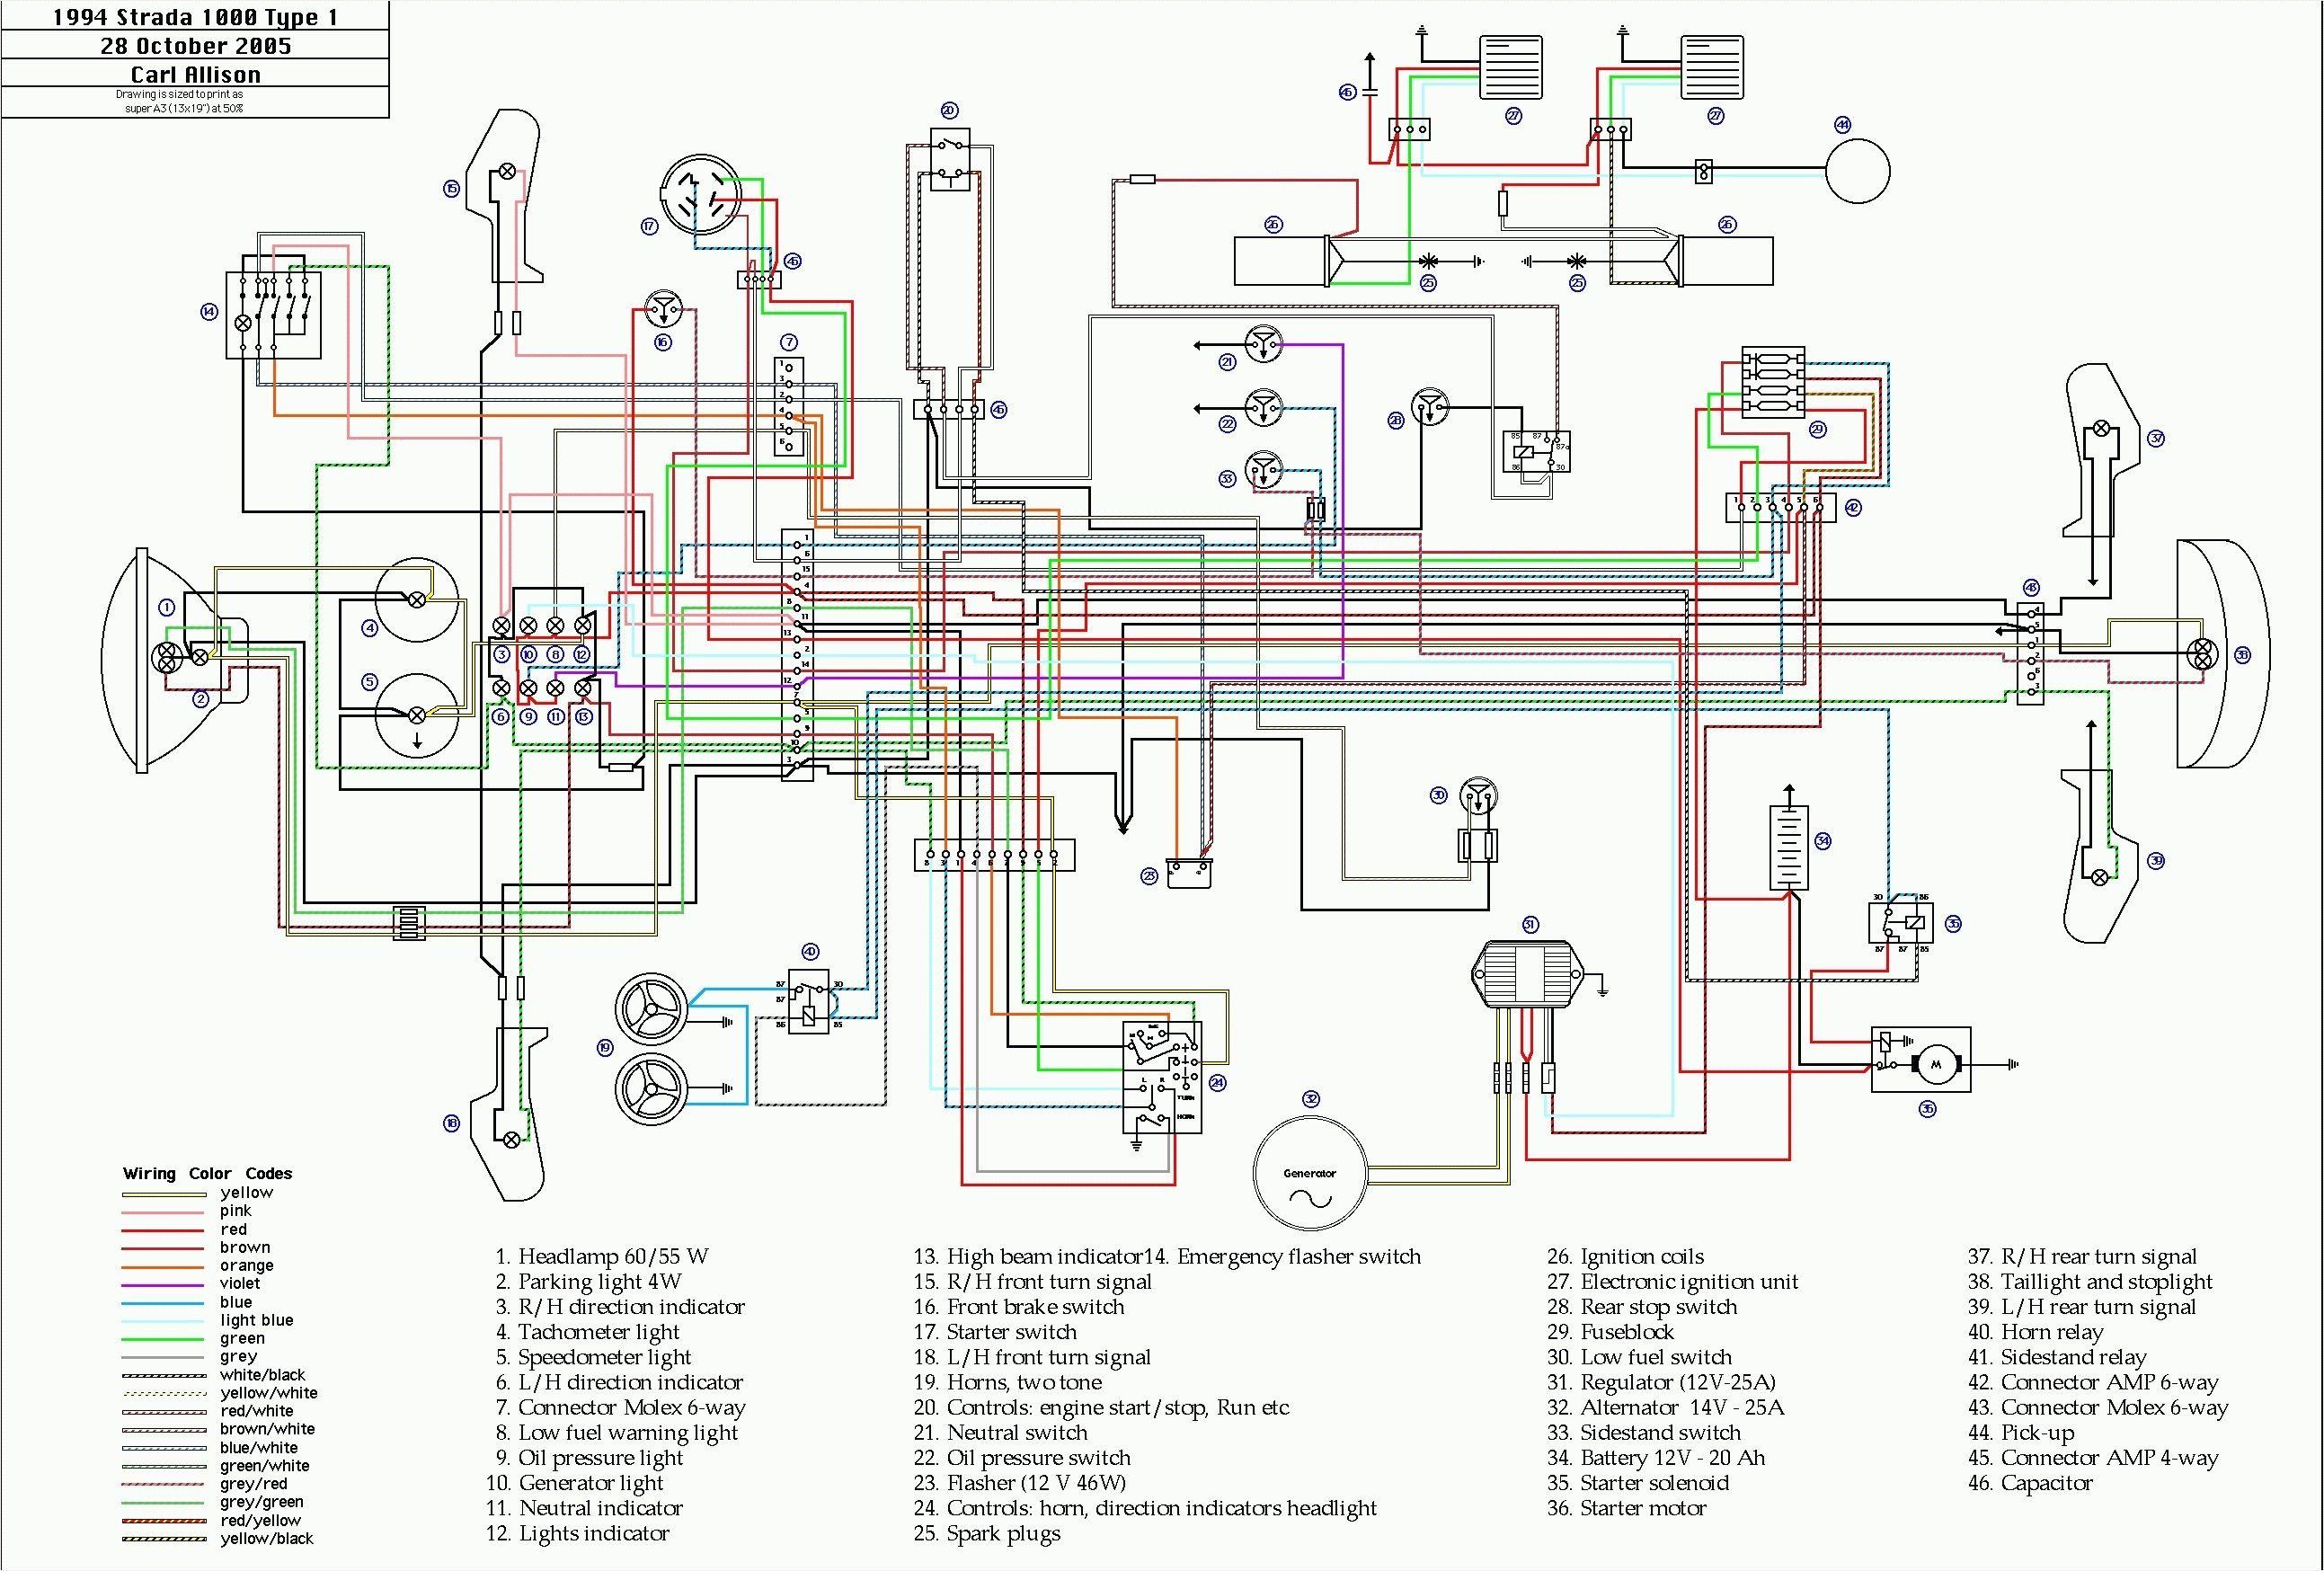 New Wiring Diagram Car Indicators Opel Corsa Trailer Wiring Diagram Opel